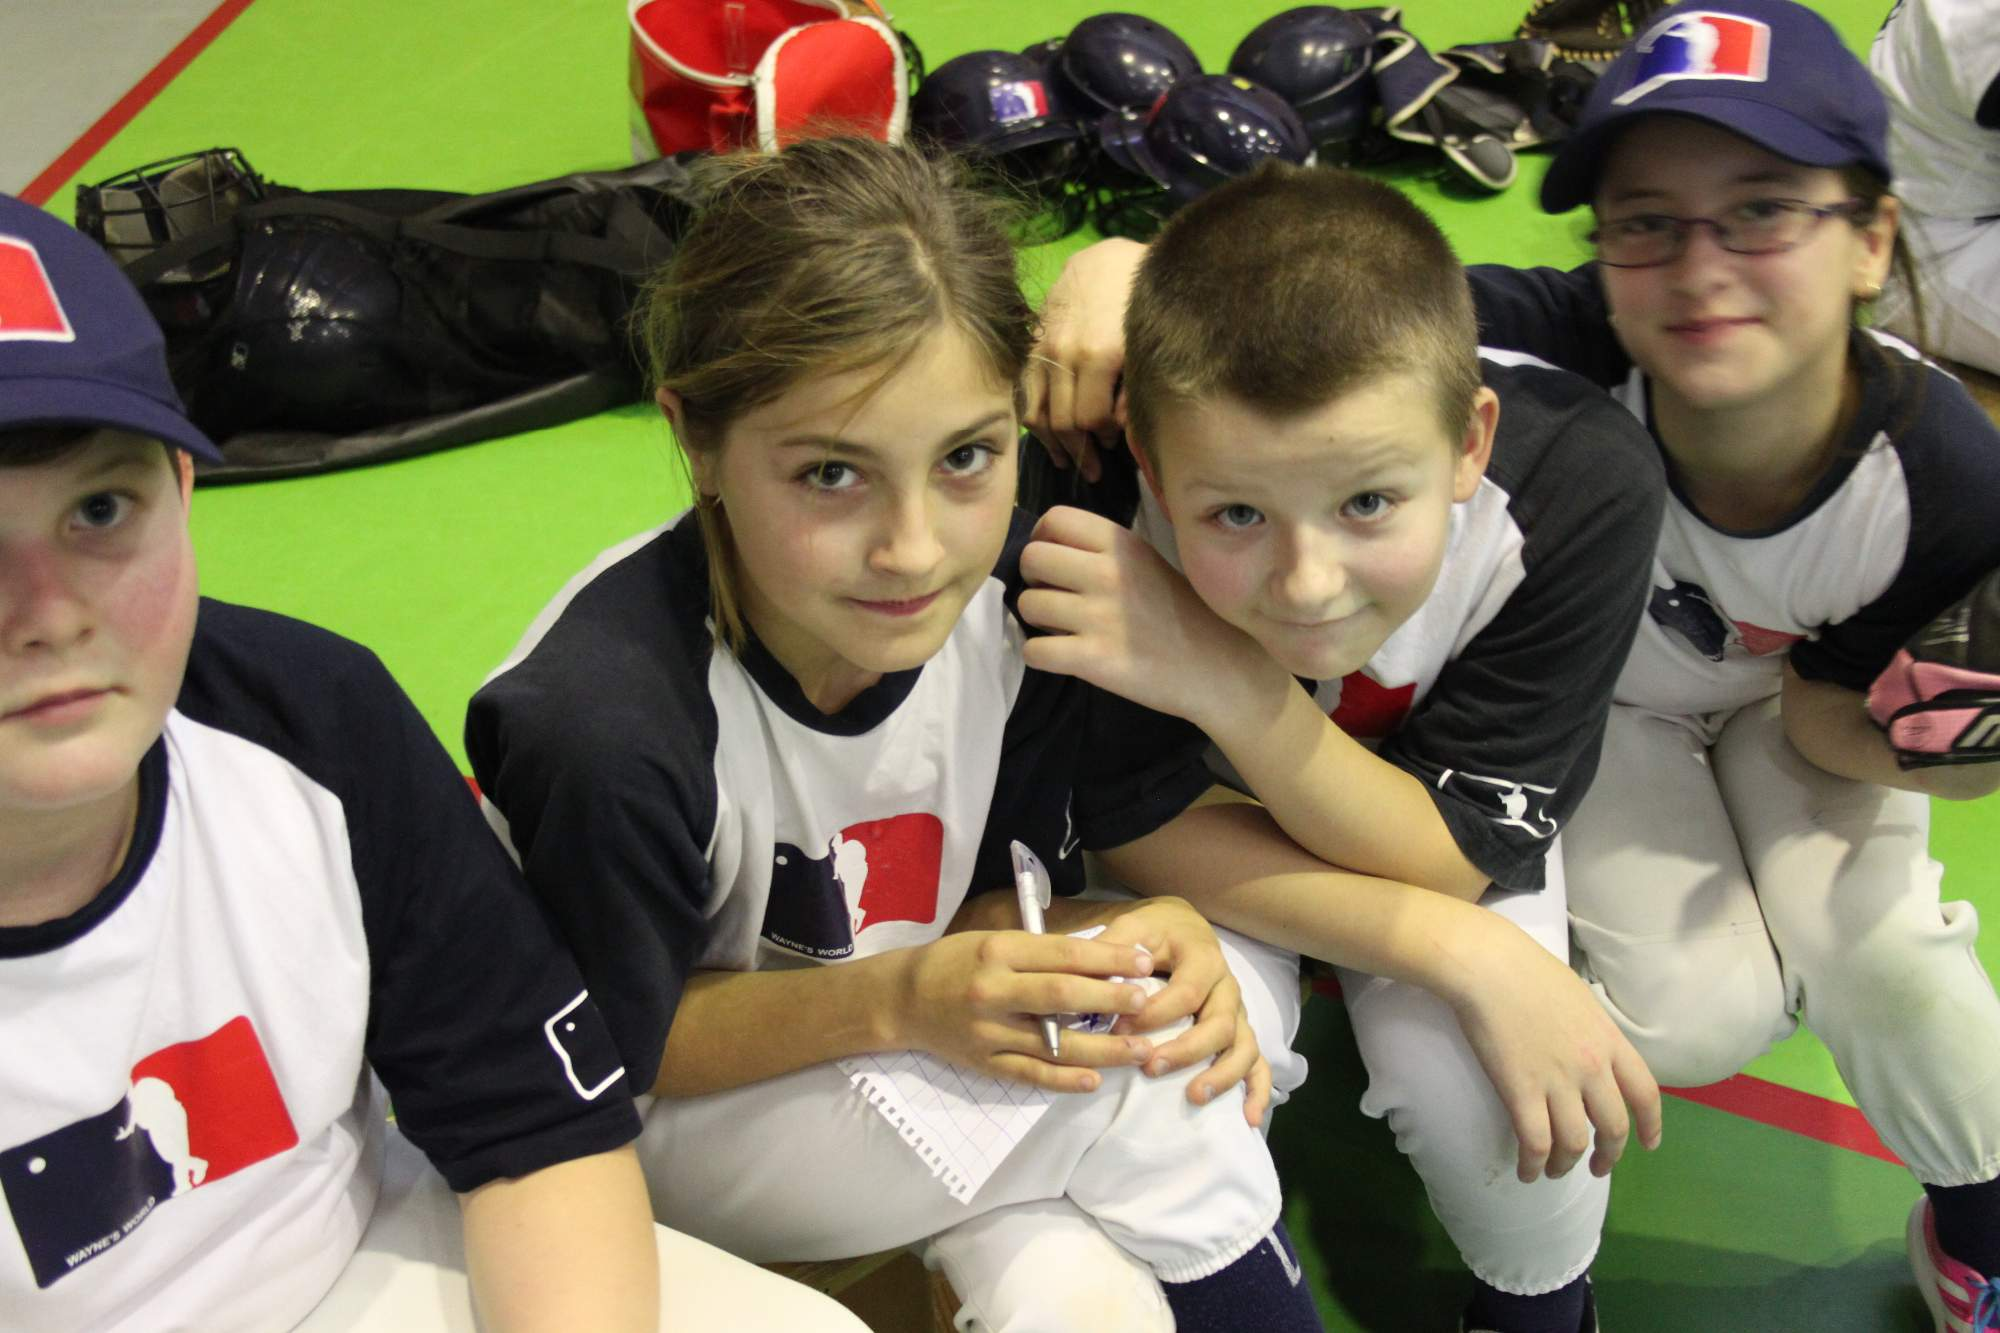 WW Indoor Cup U11 2015 | Adam, Zůza, Matěj, Áňa | fototo Šakal